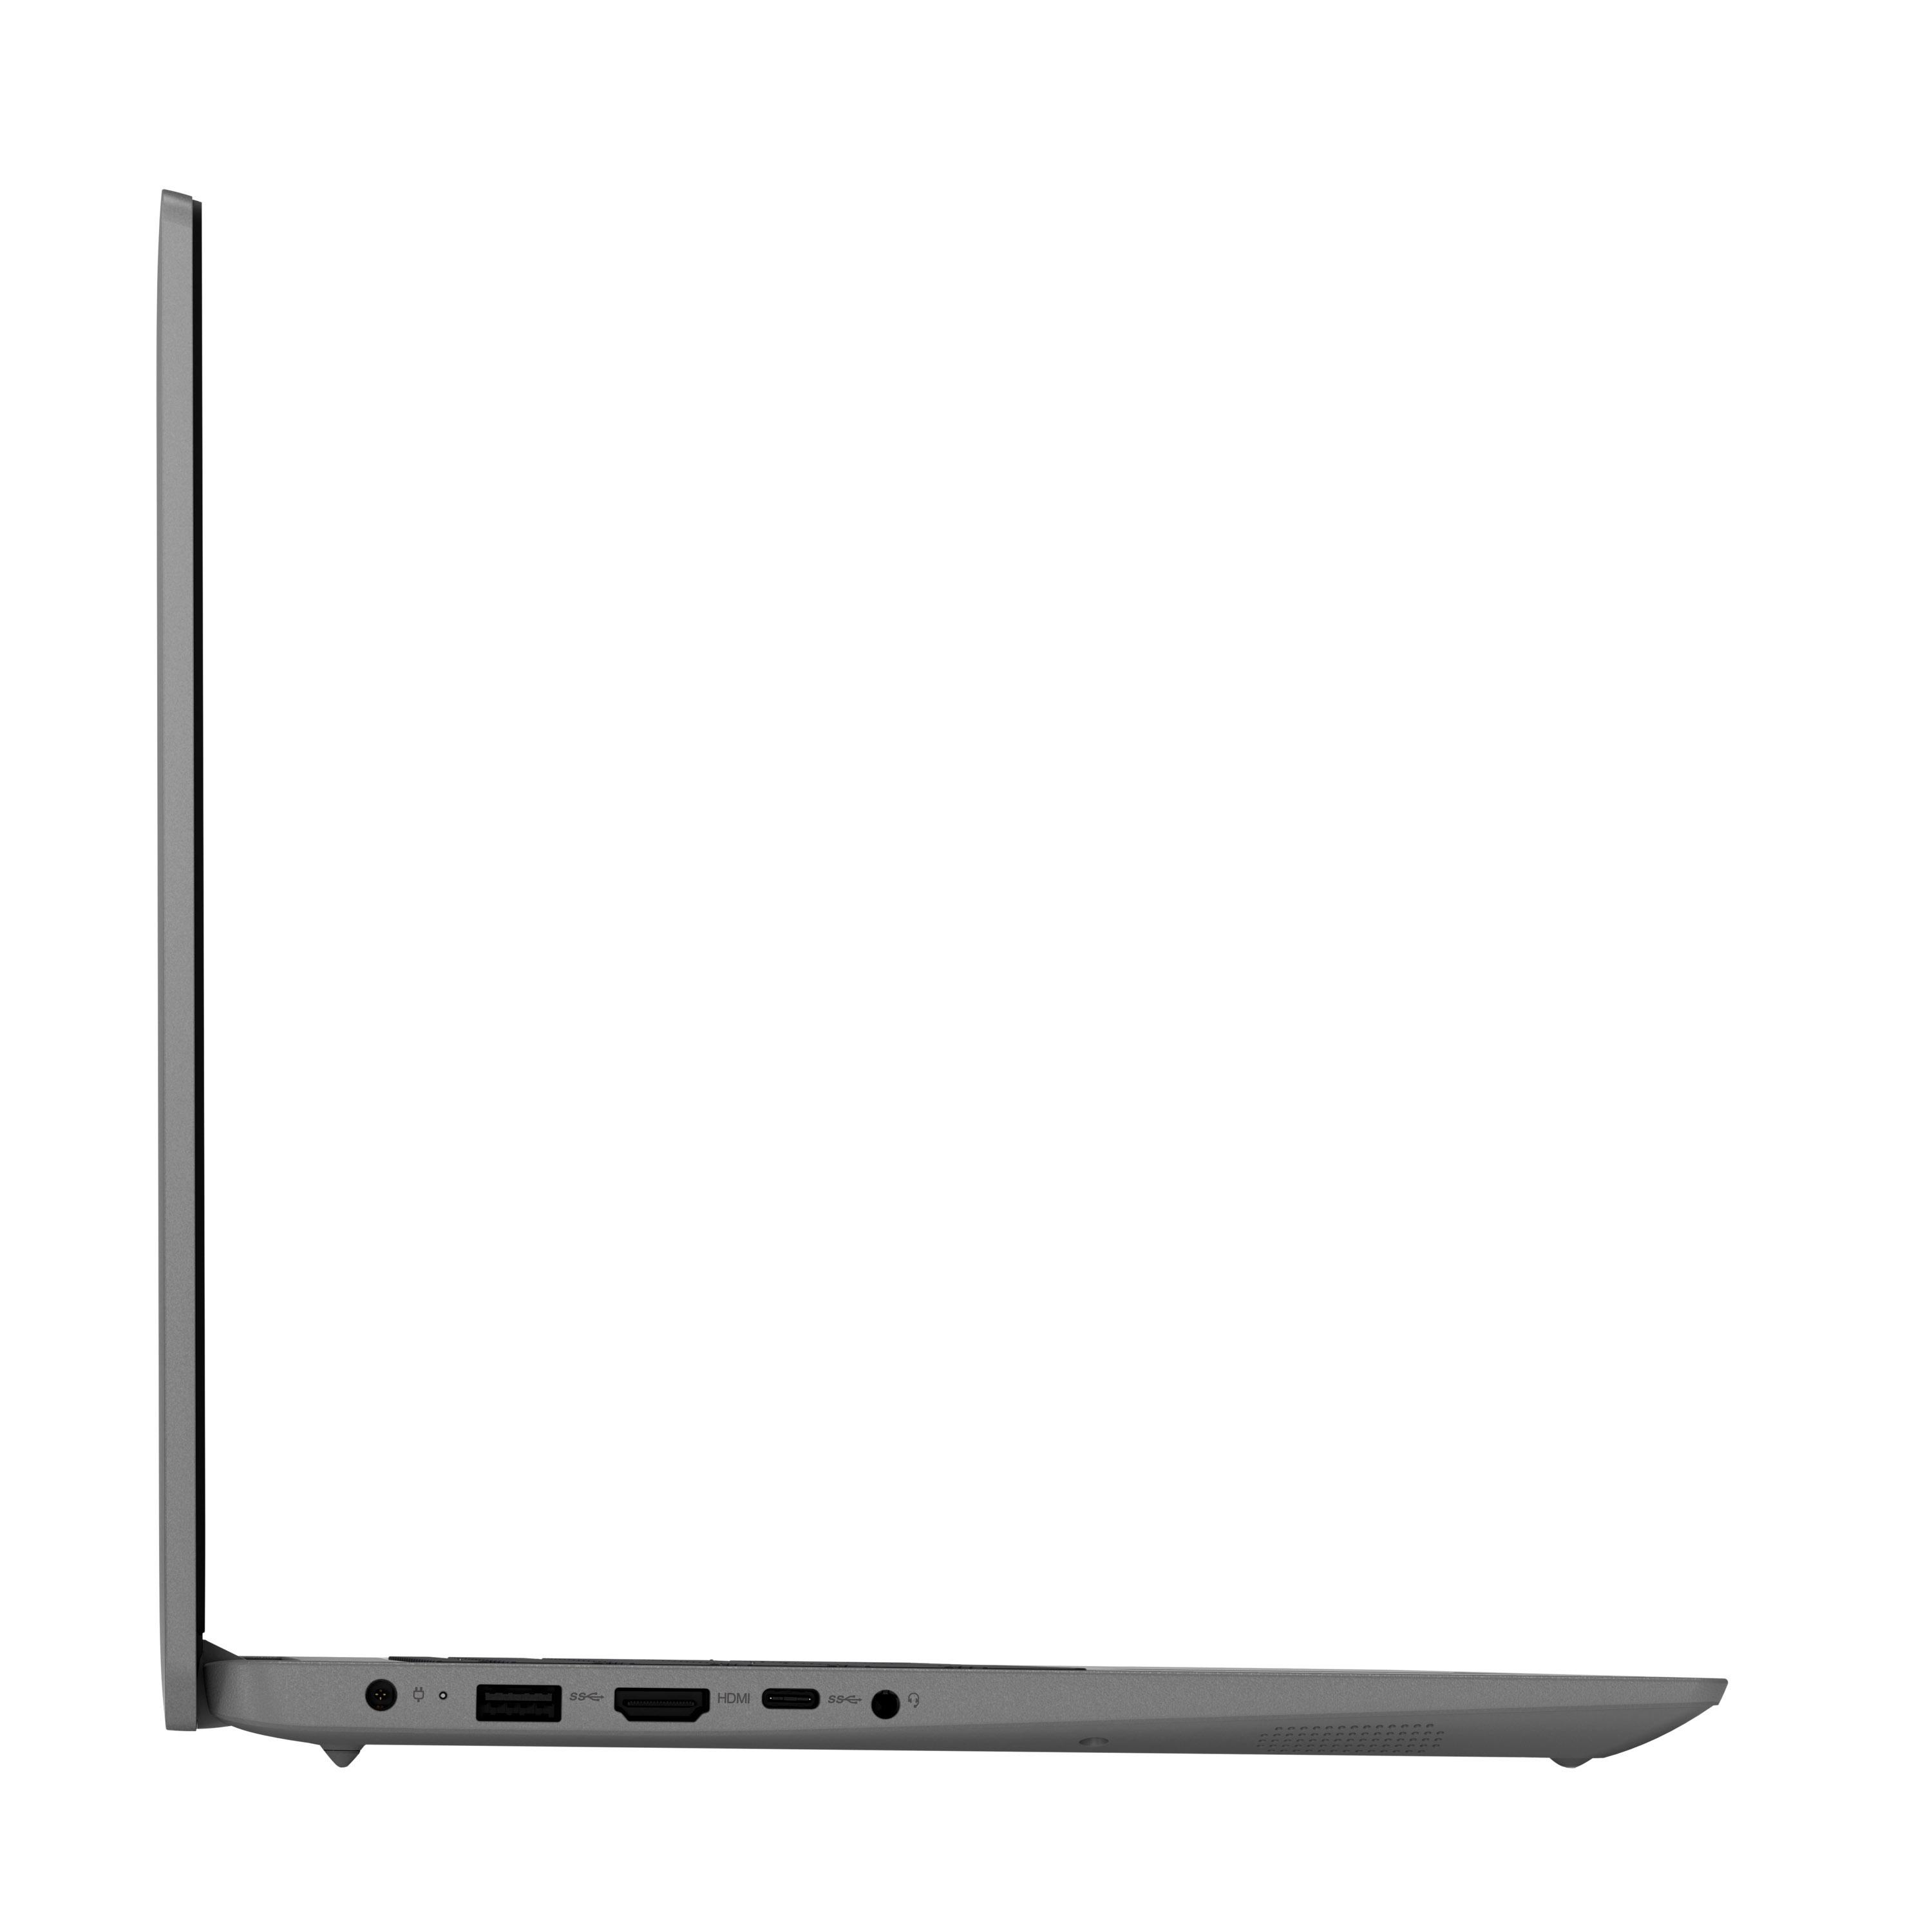 Фото  Ноутбук Lenovo ideapad 3 15ALC6 Arctic Grey (82KU00CURE)